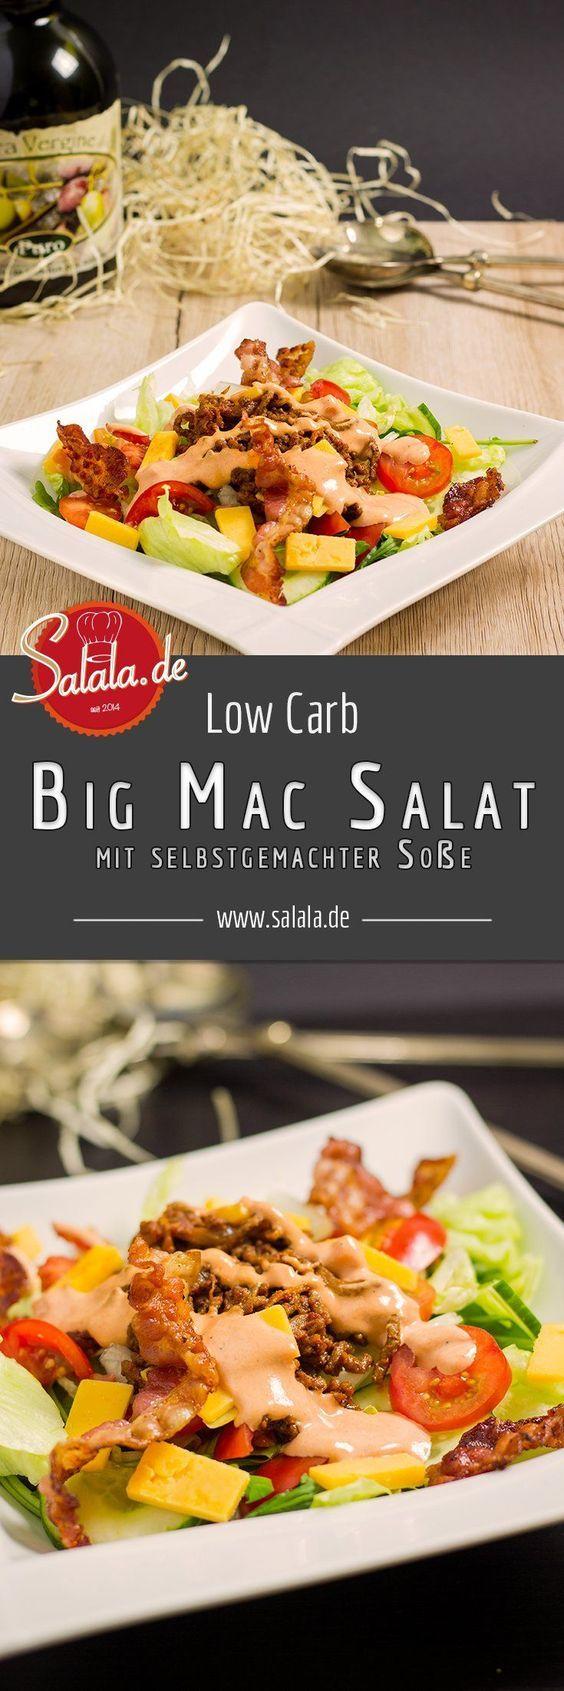 Big Mac Salat mit Bacon Low Carb